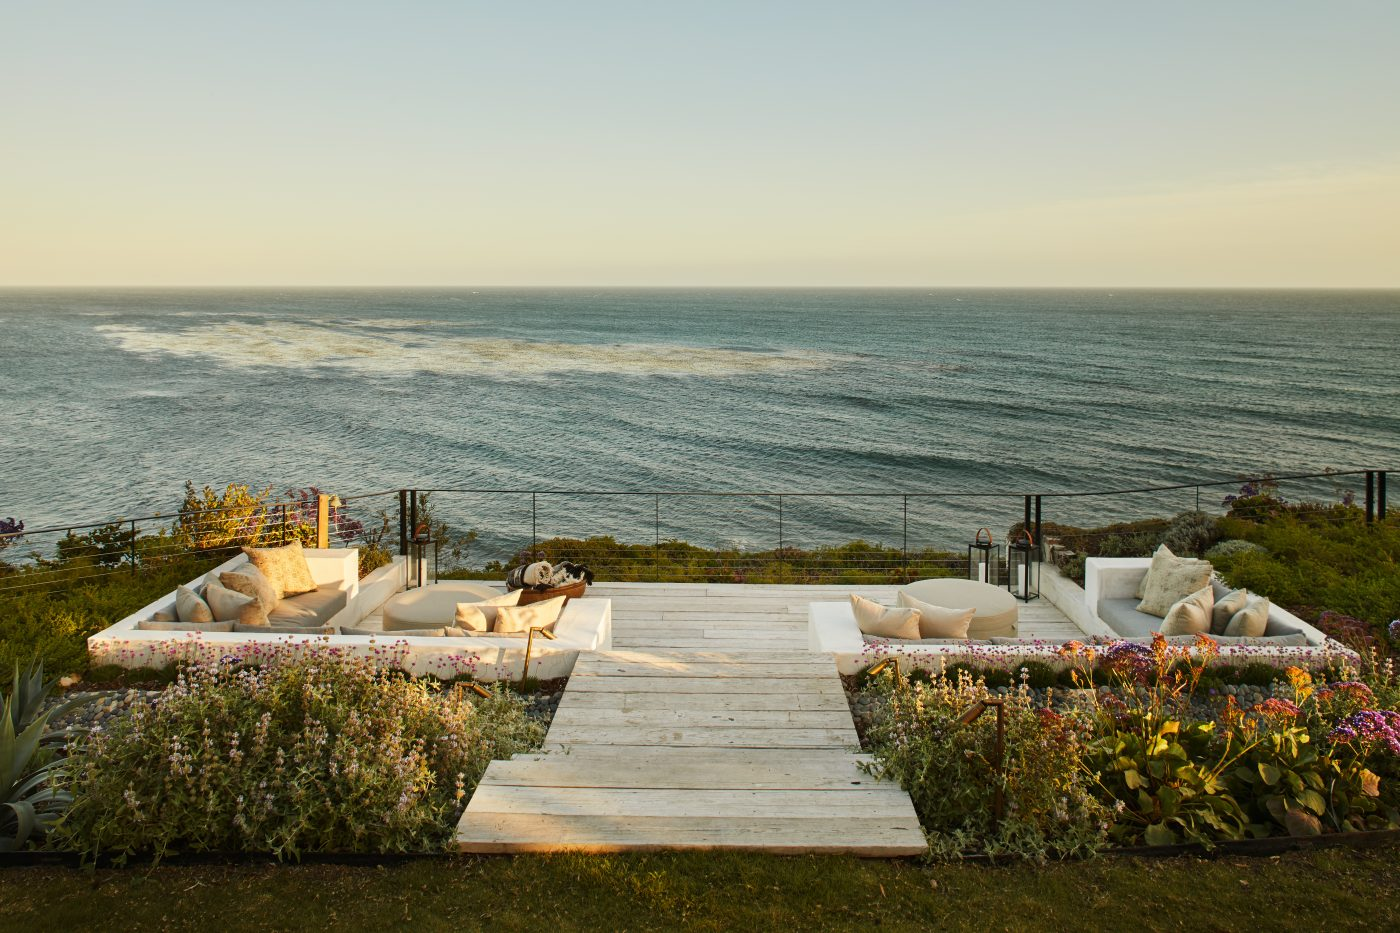 Beach overlook deck designed by Alexander